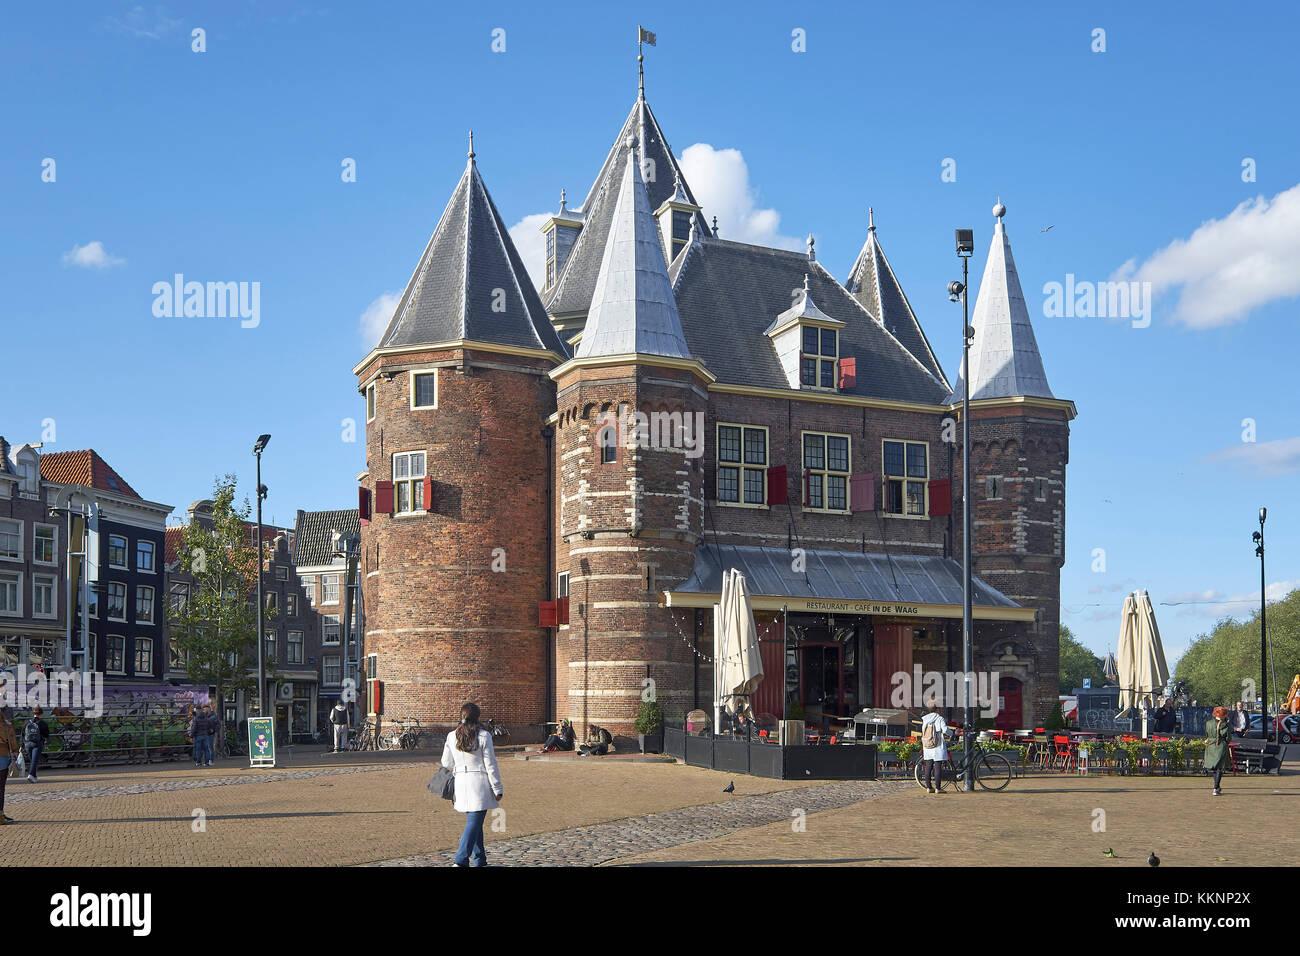 De Waag at Nieuwmarkt in Amsterdam, North Holland, Netherlands - Stock Image